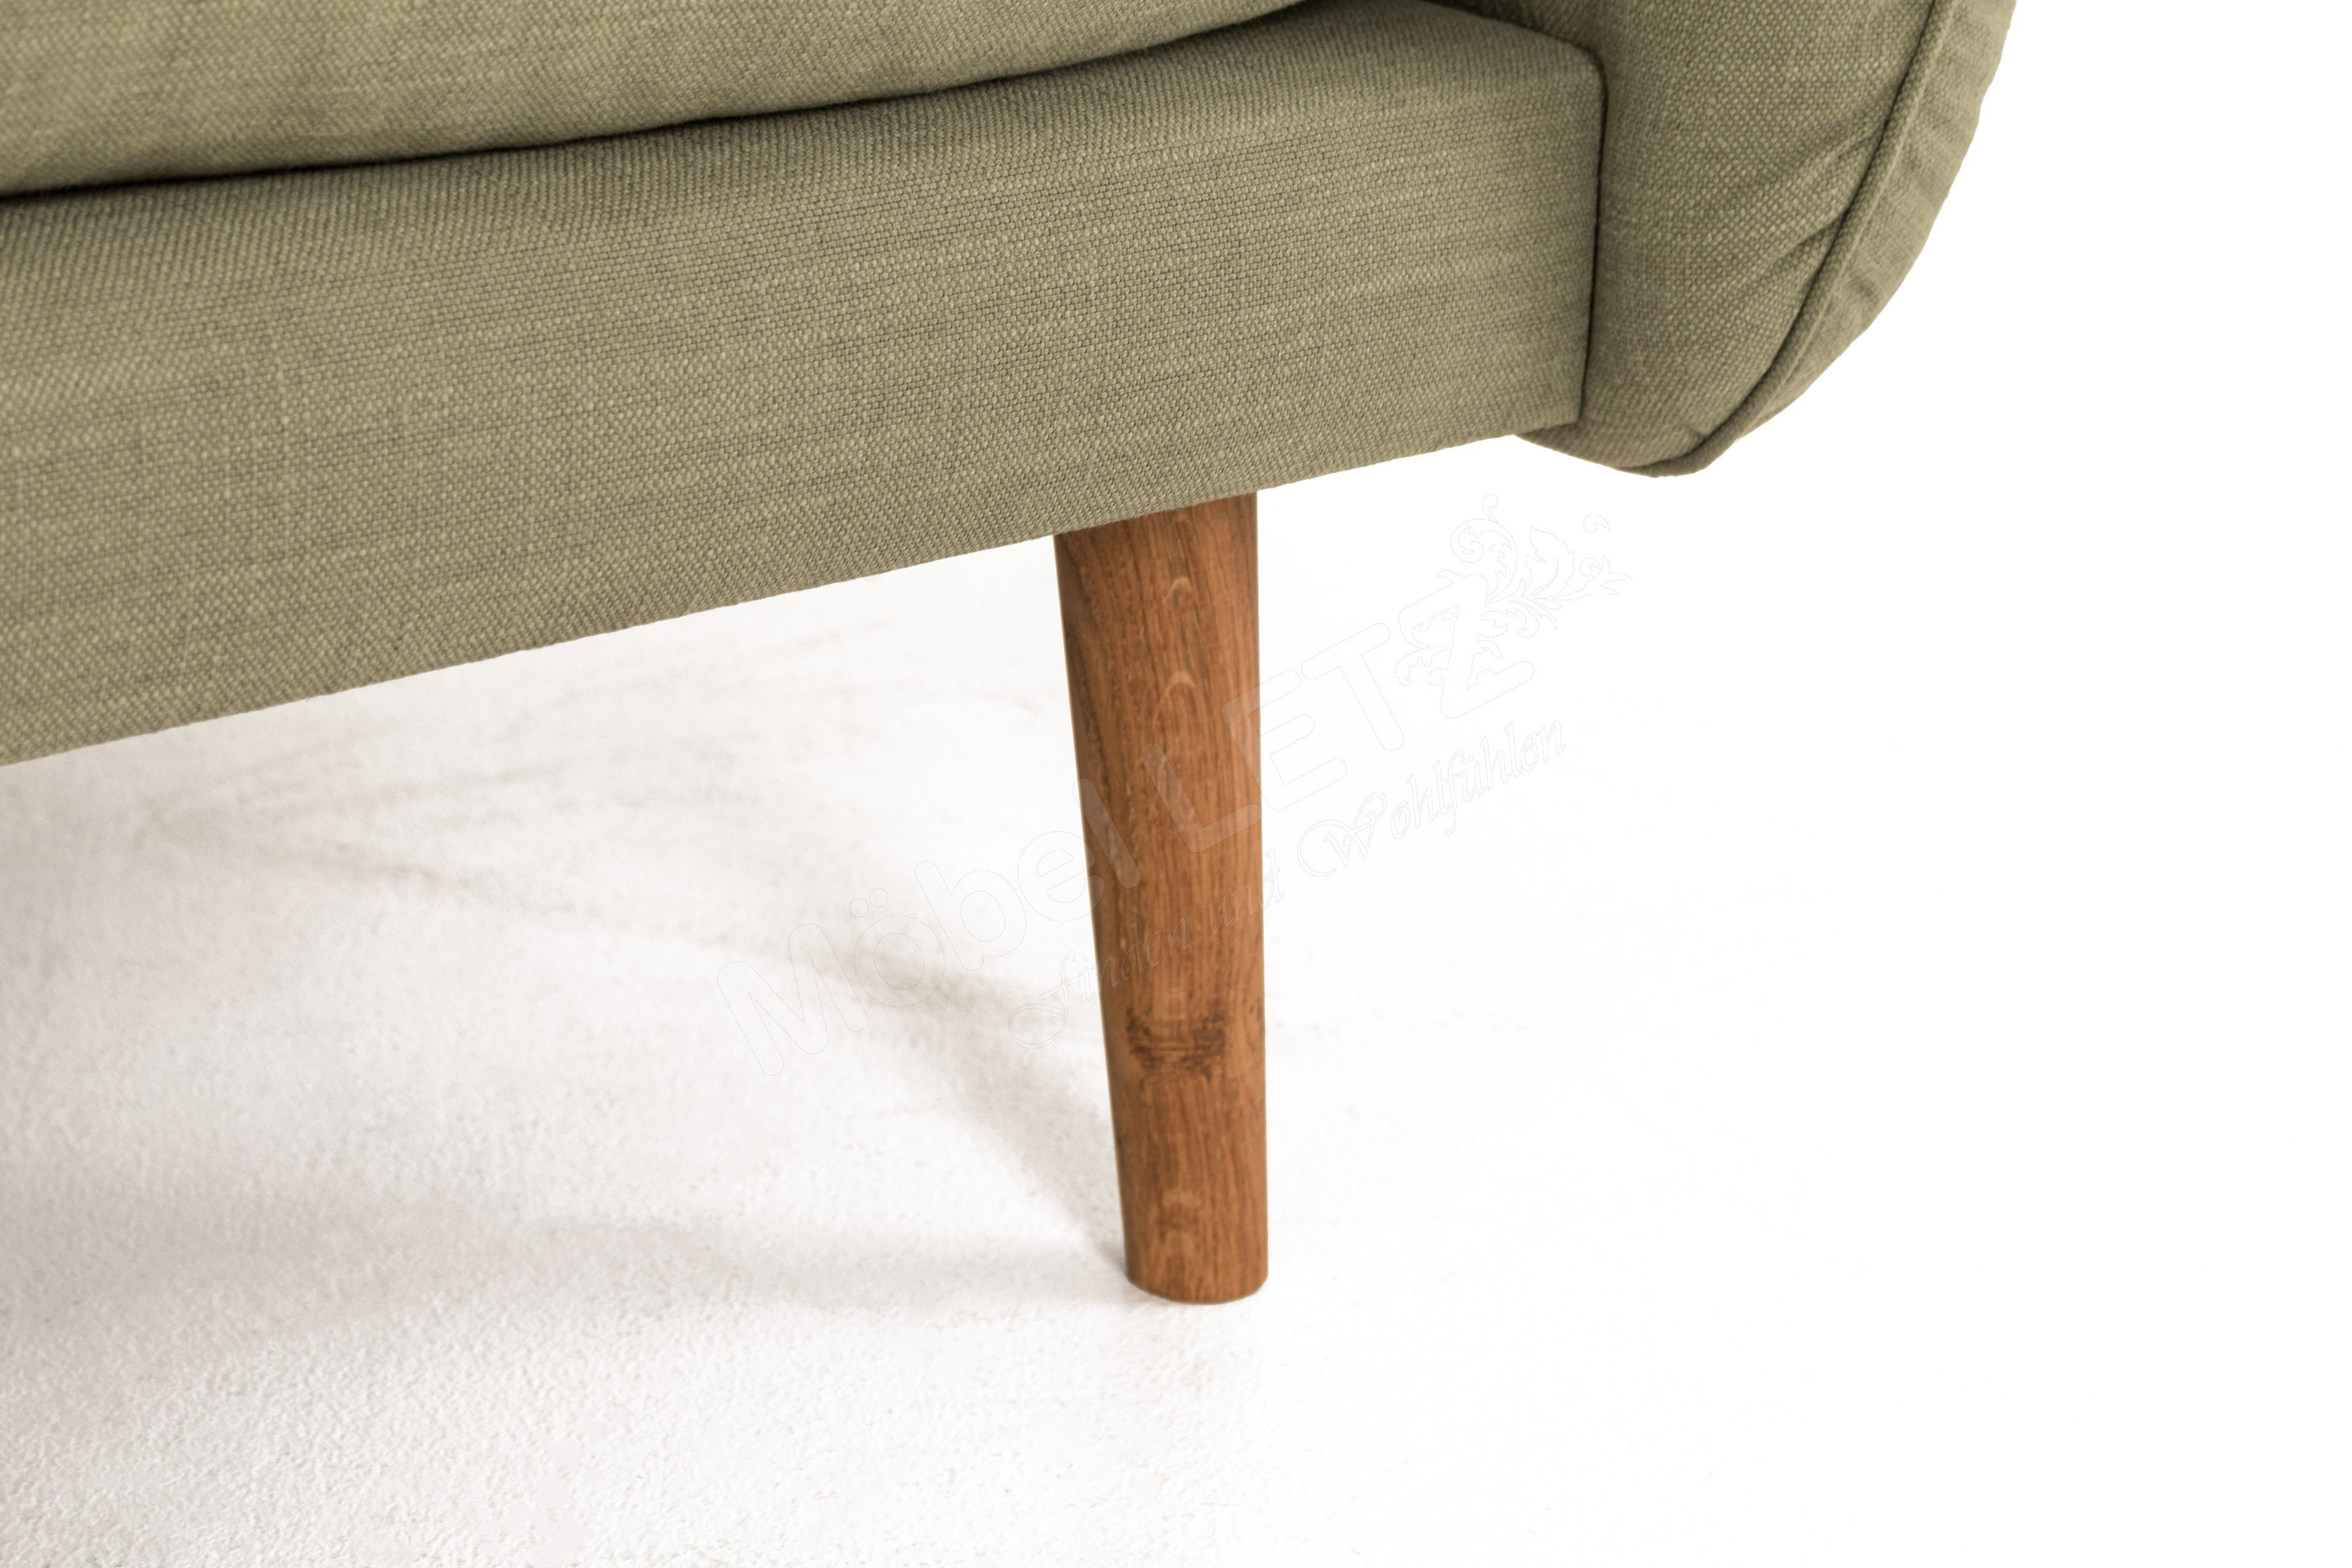 skandinavische m bel sander sofa in gr n m bel letz. Black Bedroom Furniture Sets. Home Design Ideas